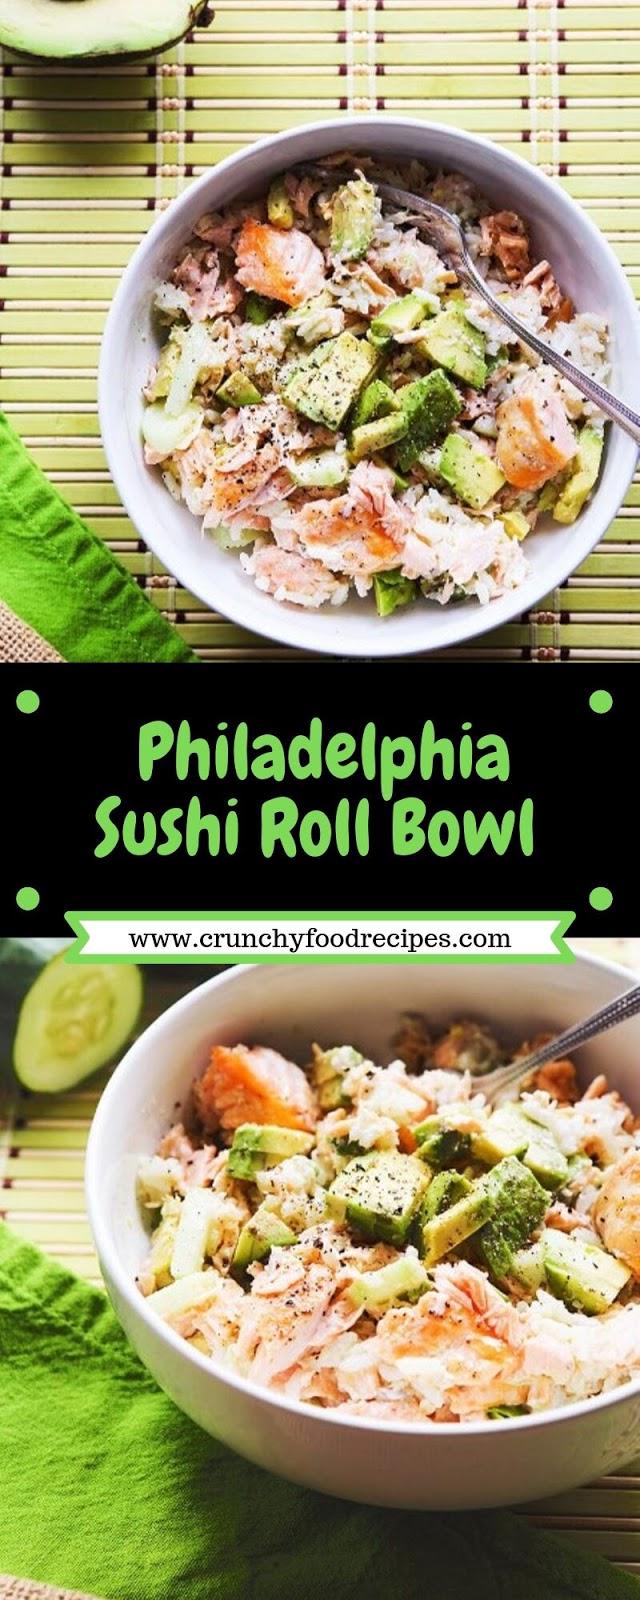 Philadelphia Sushi Roll Bowl